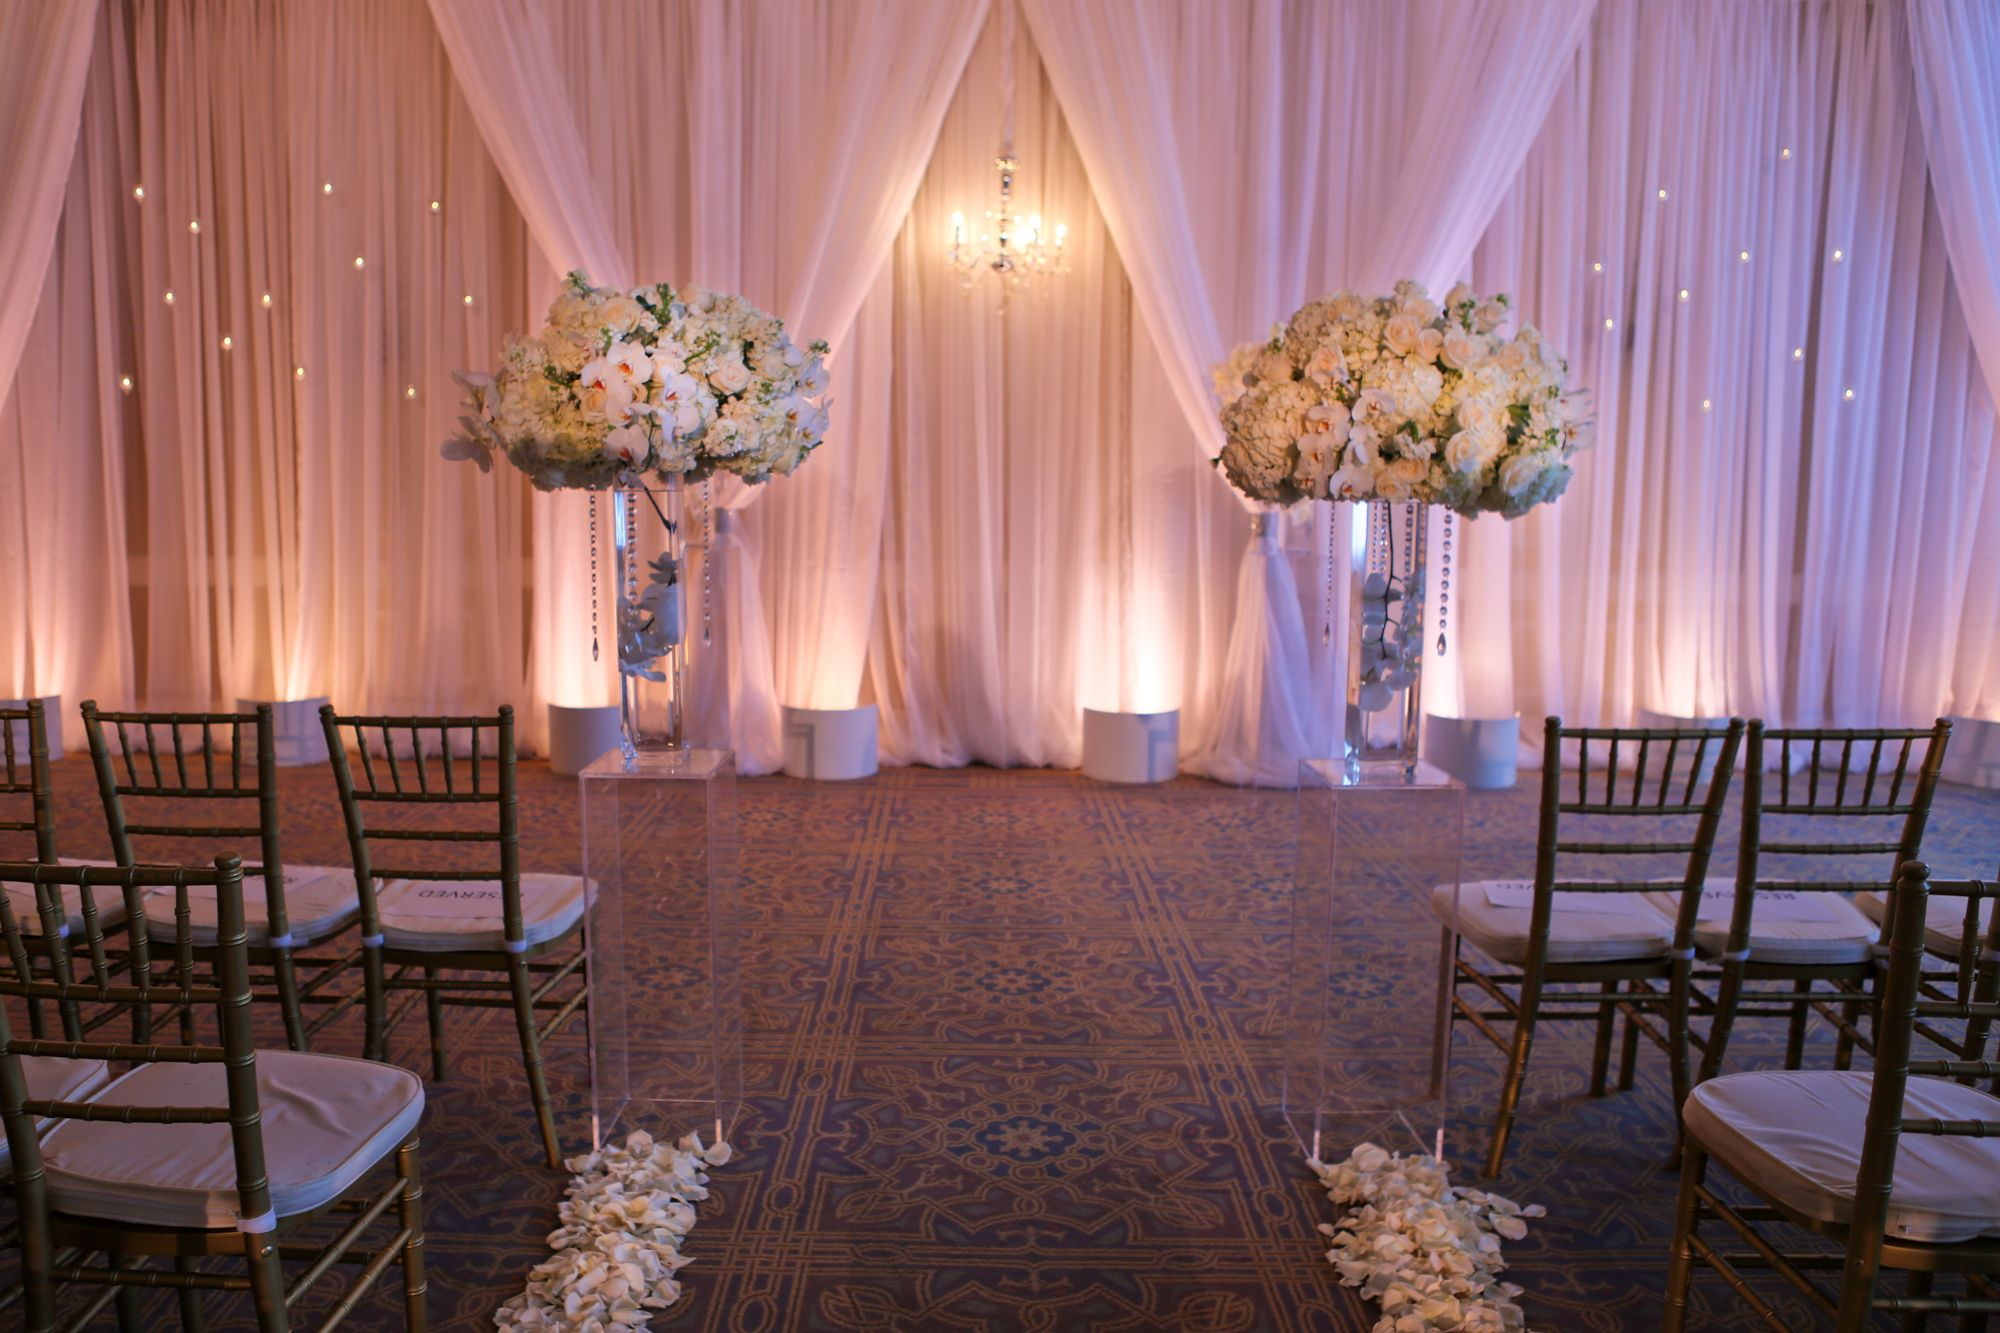 JL IMAGINATION Lighting Design & Drapery Wedding drapery